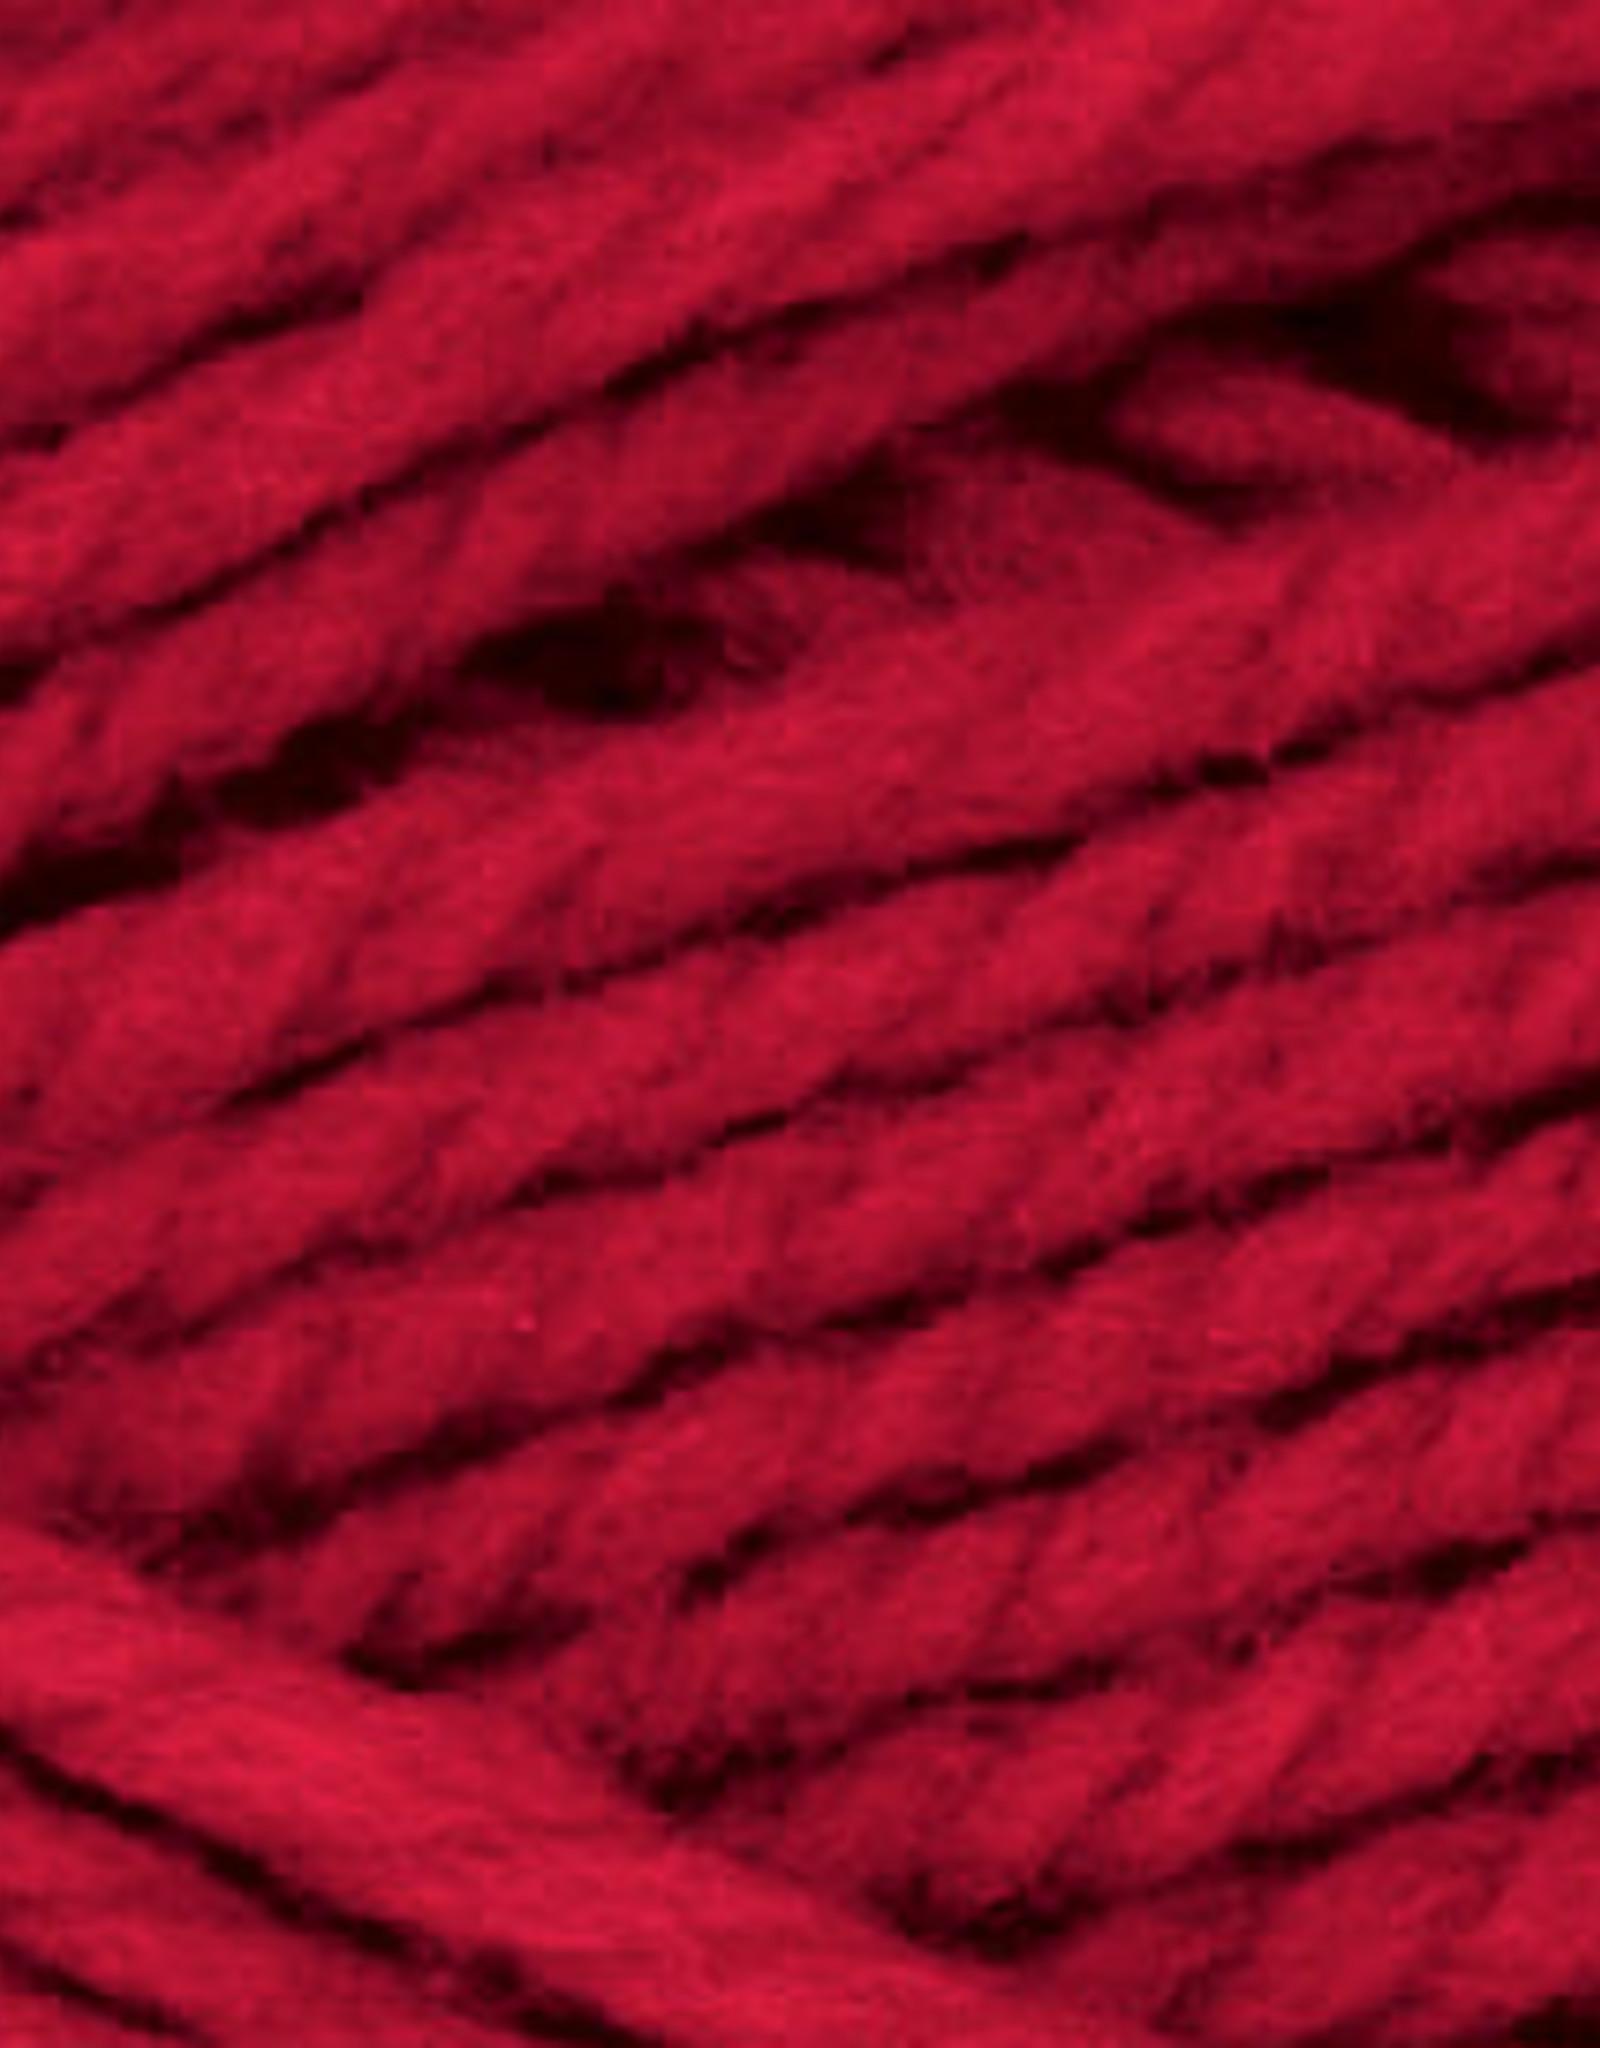 Brown Sheep NatureSpun Sp 50g N46 Red Fox